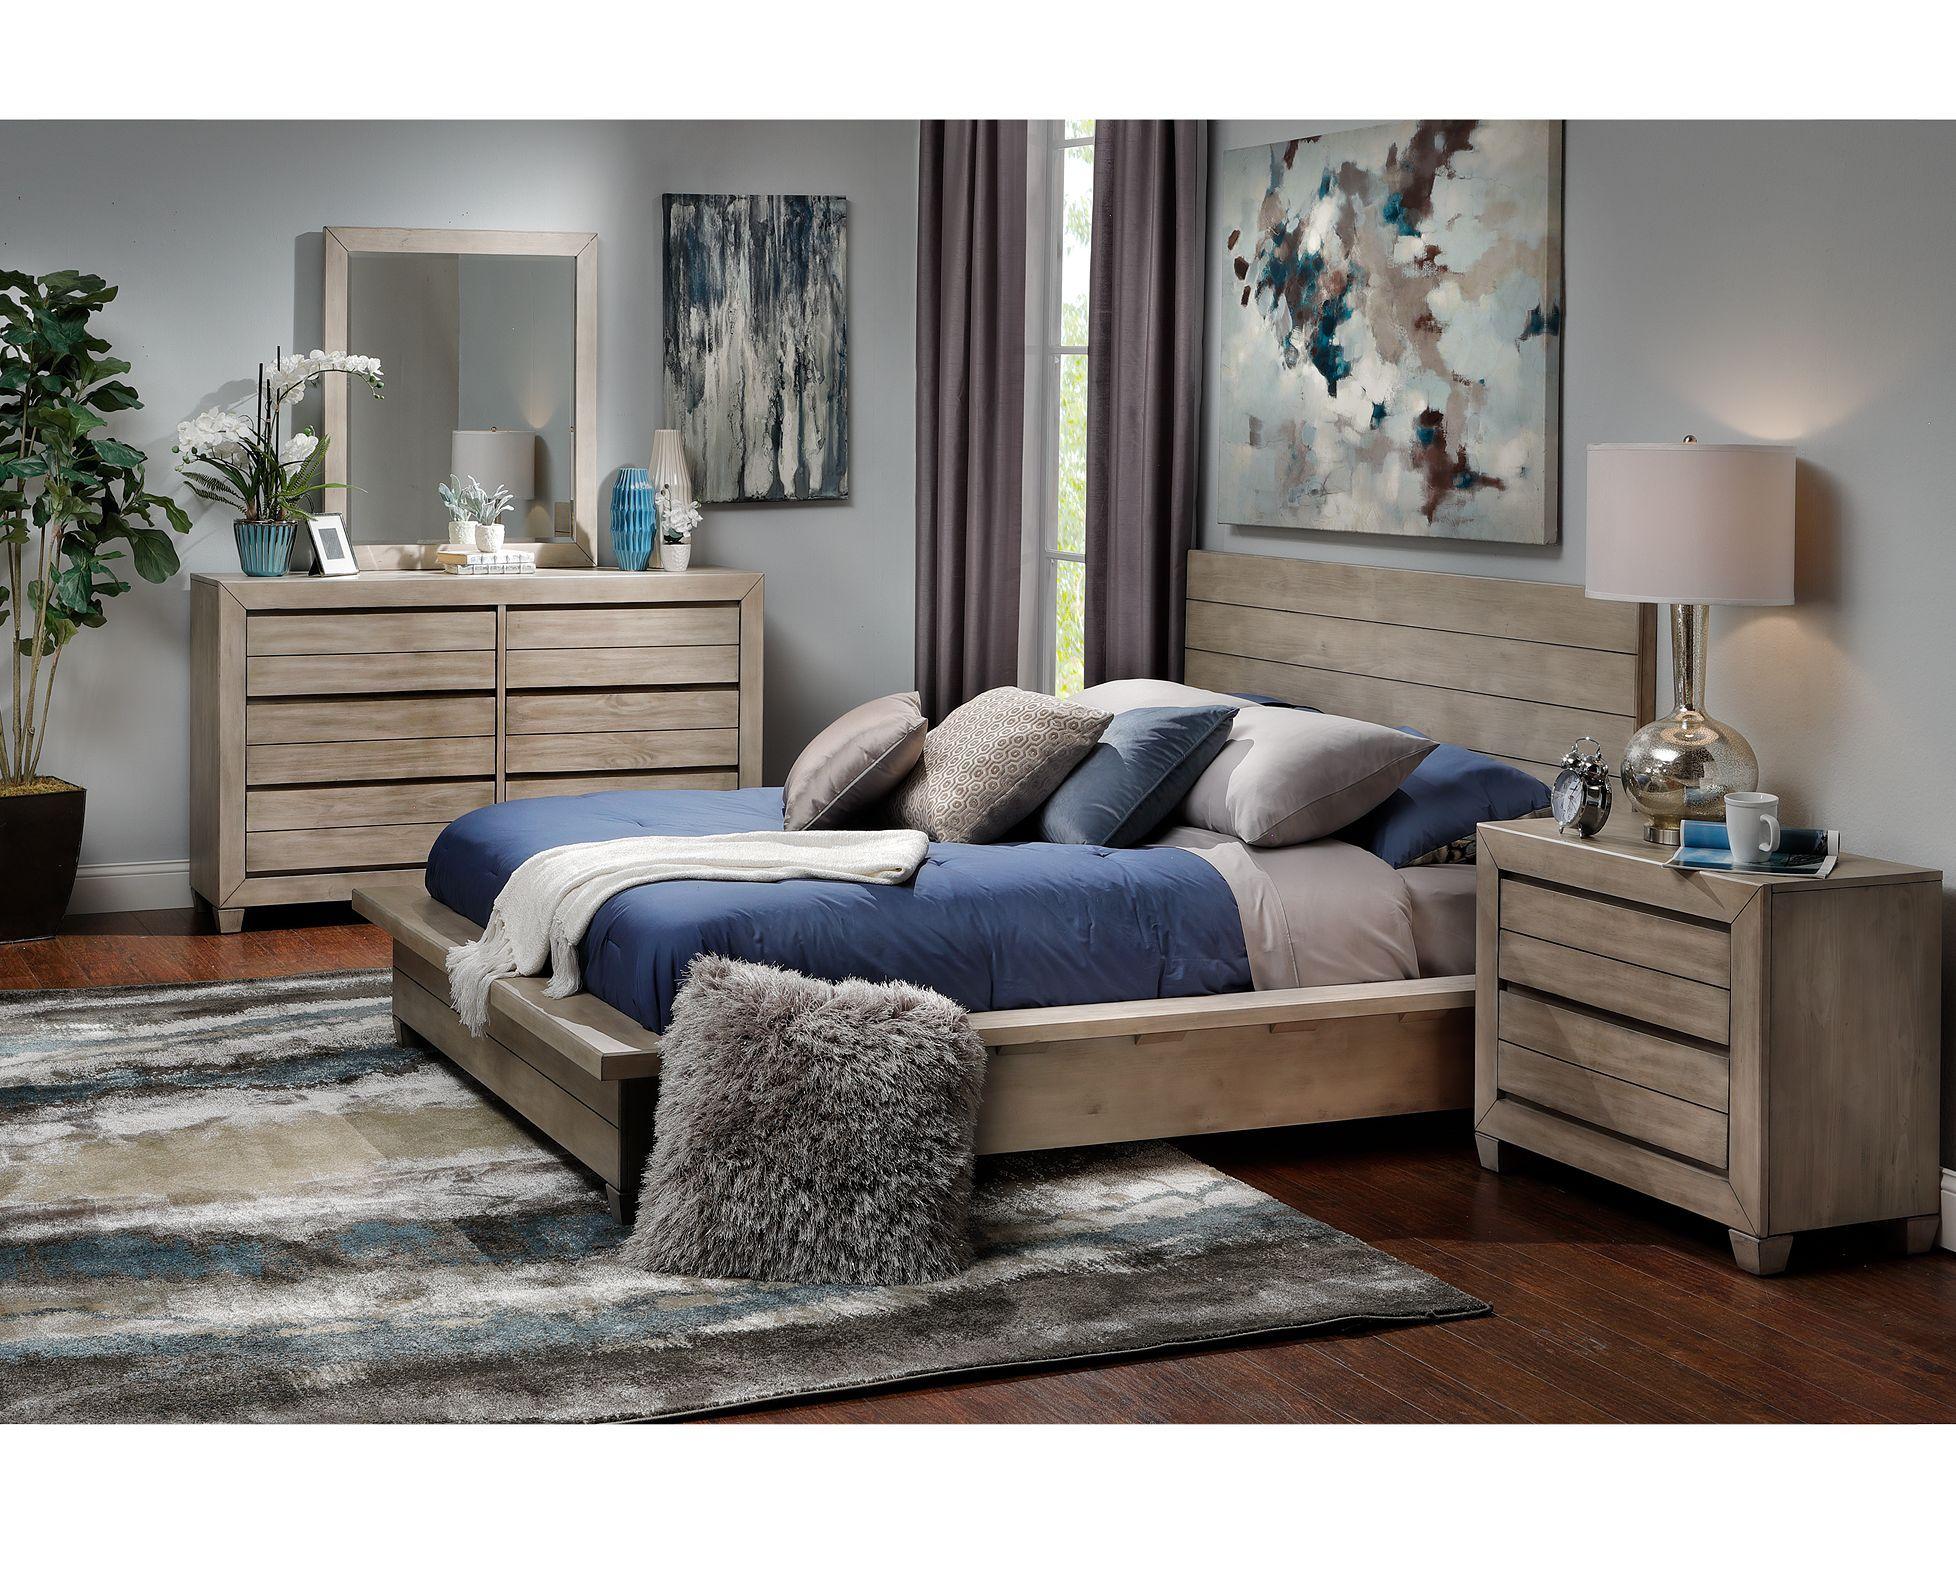 Portland Bedroom Set - Furniture Row  Rowe furniture, Furniture